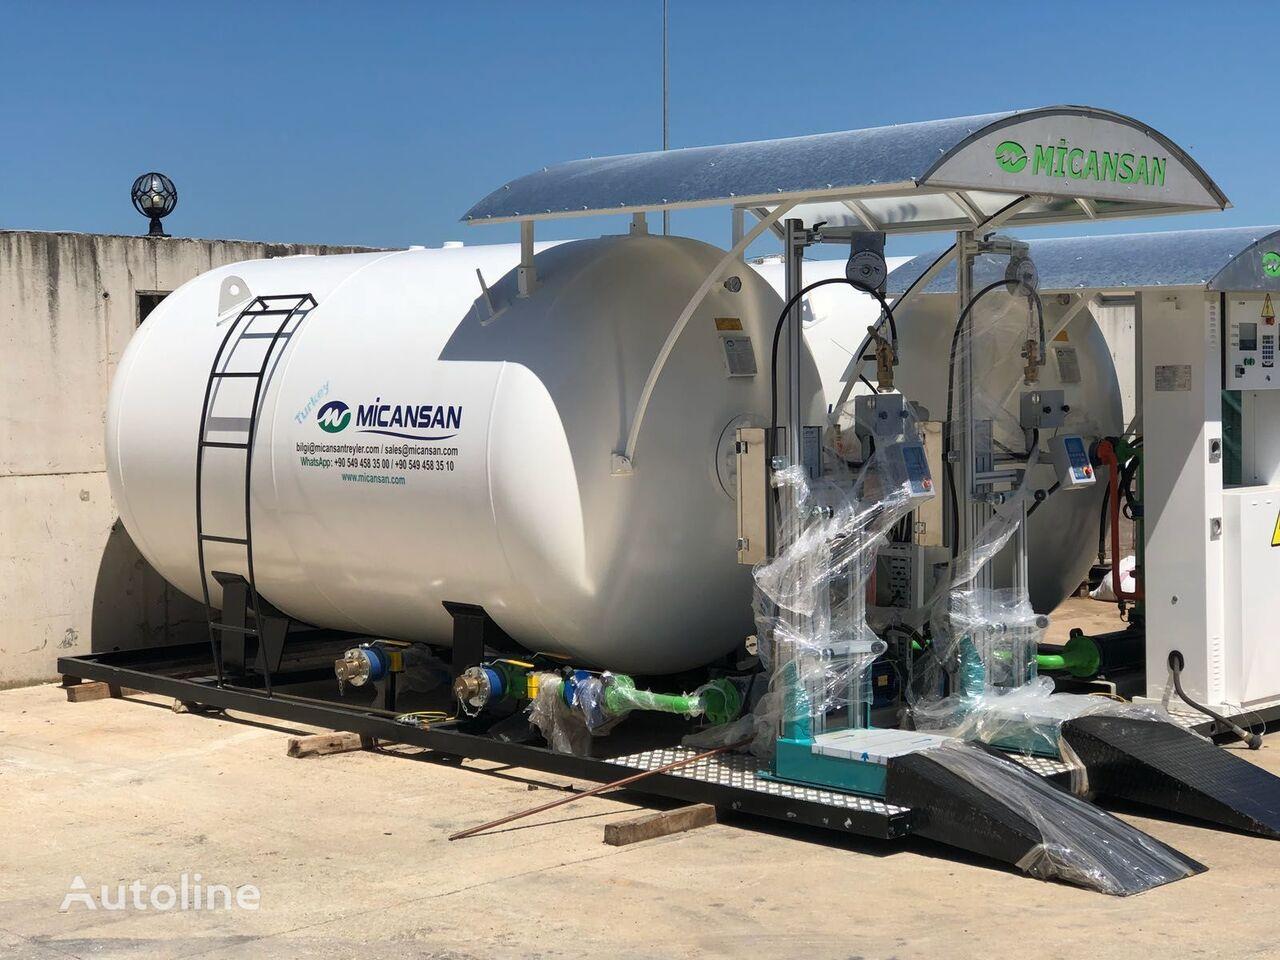 naujas dujų cisterna Micansan BIG DISCOUNT NEW 2019 LPG SKID SYSTEMS FILLING SCALES